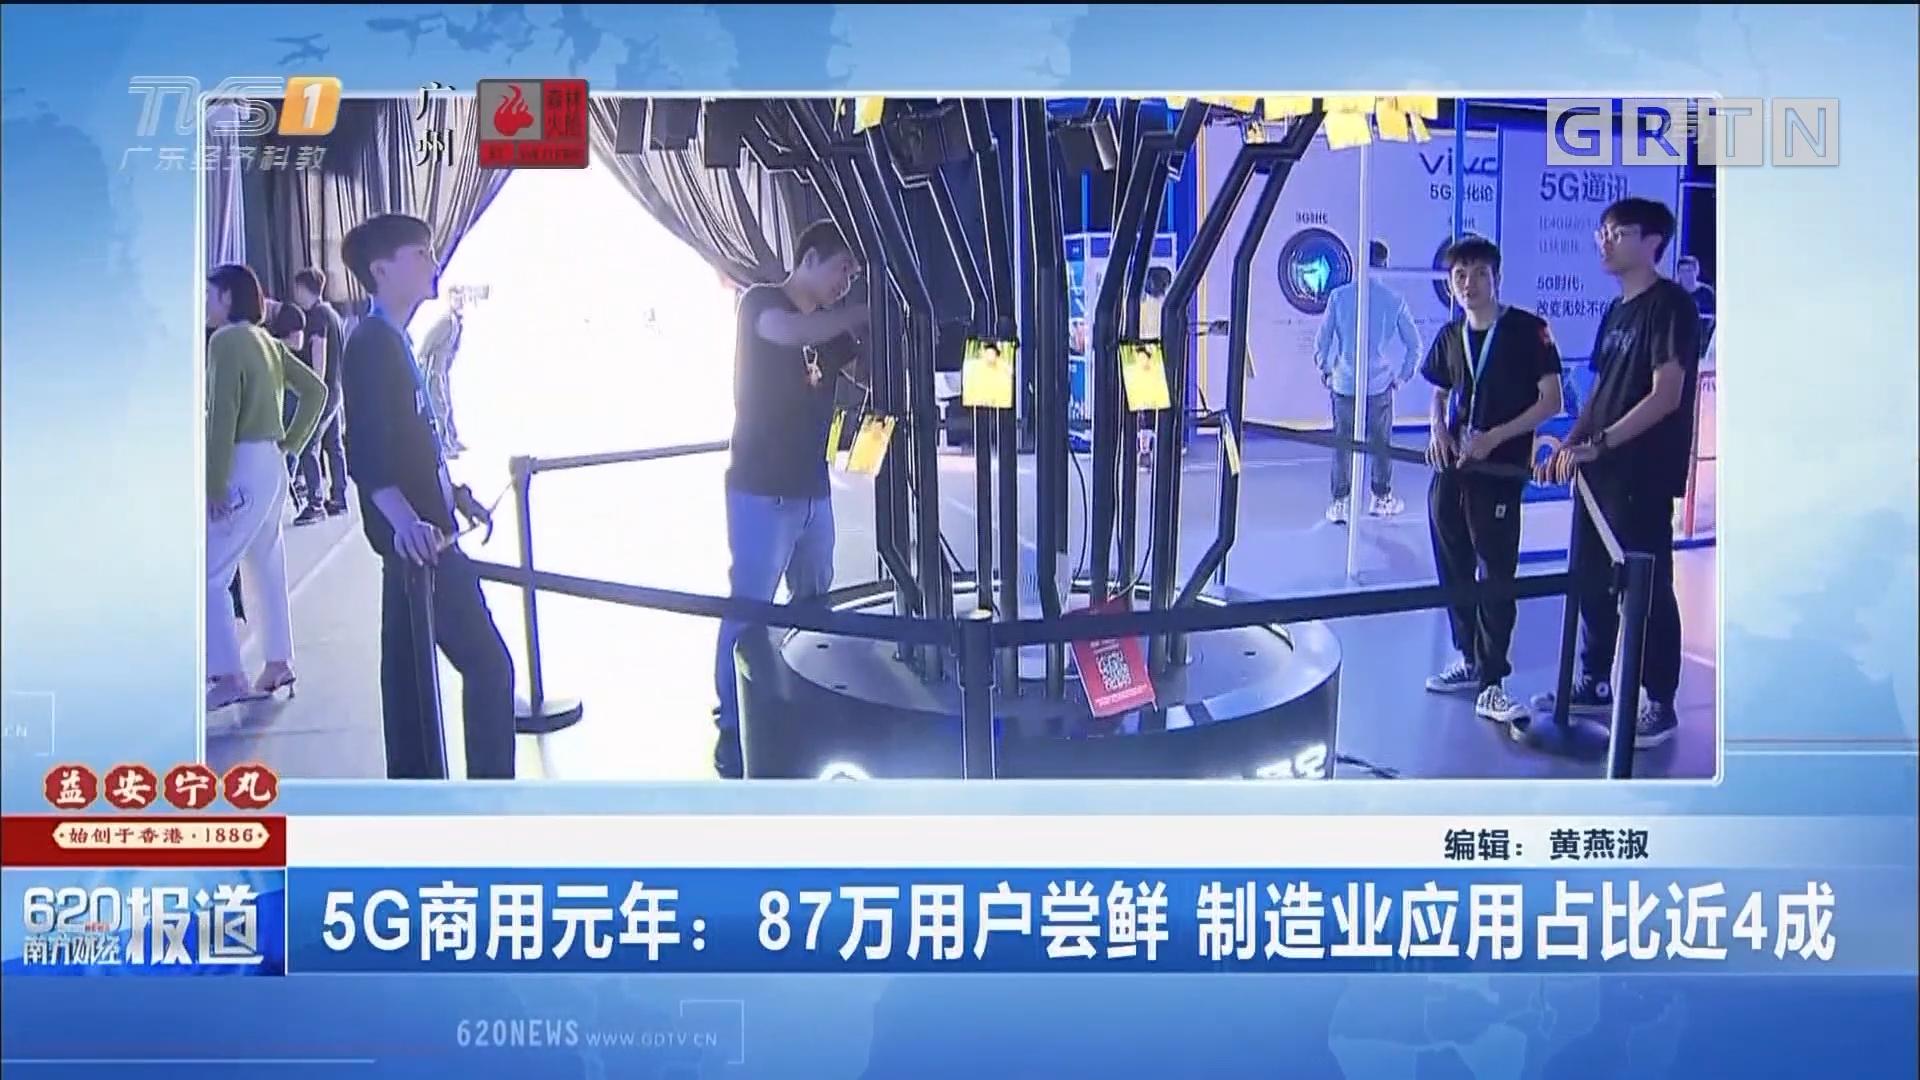 5G商用元年:87万用户尝鲜 制造业应用占比近4成